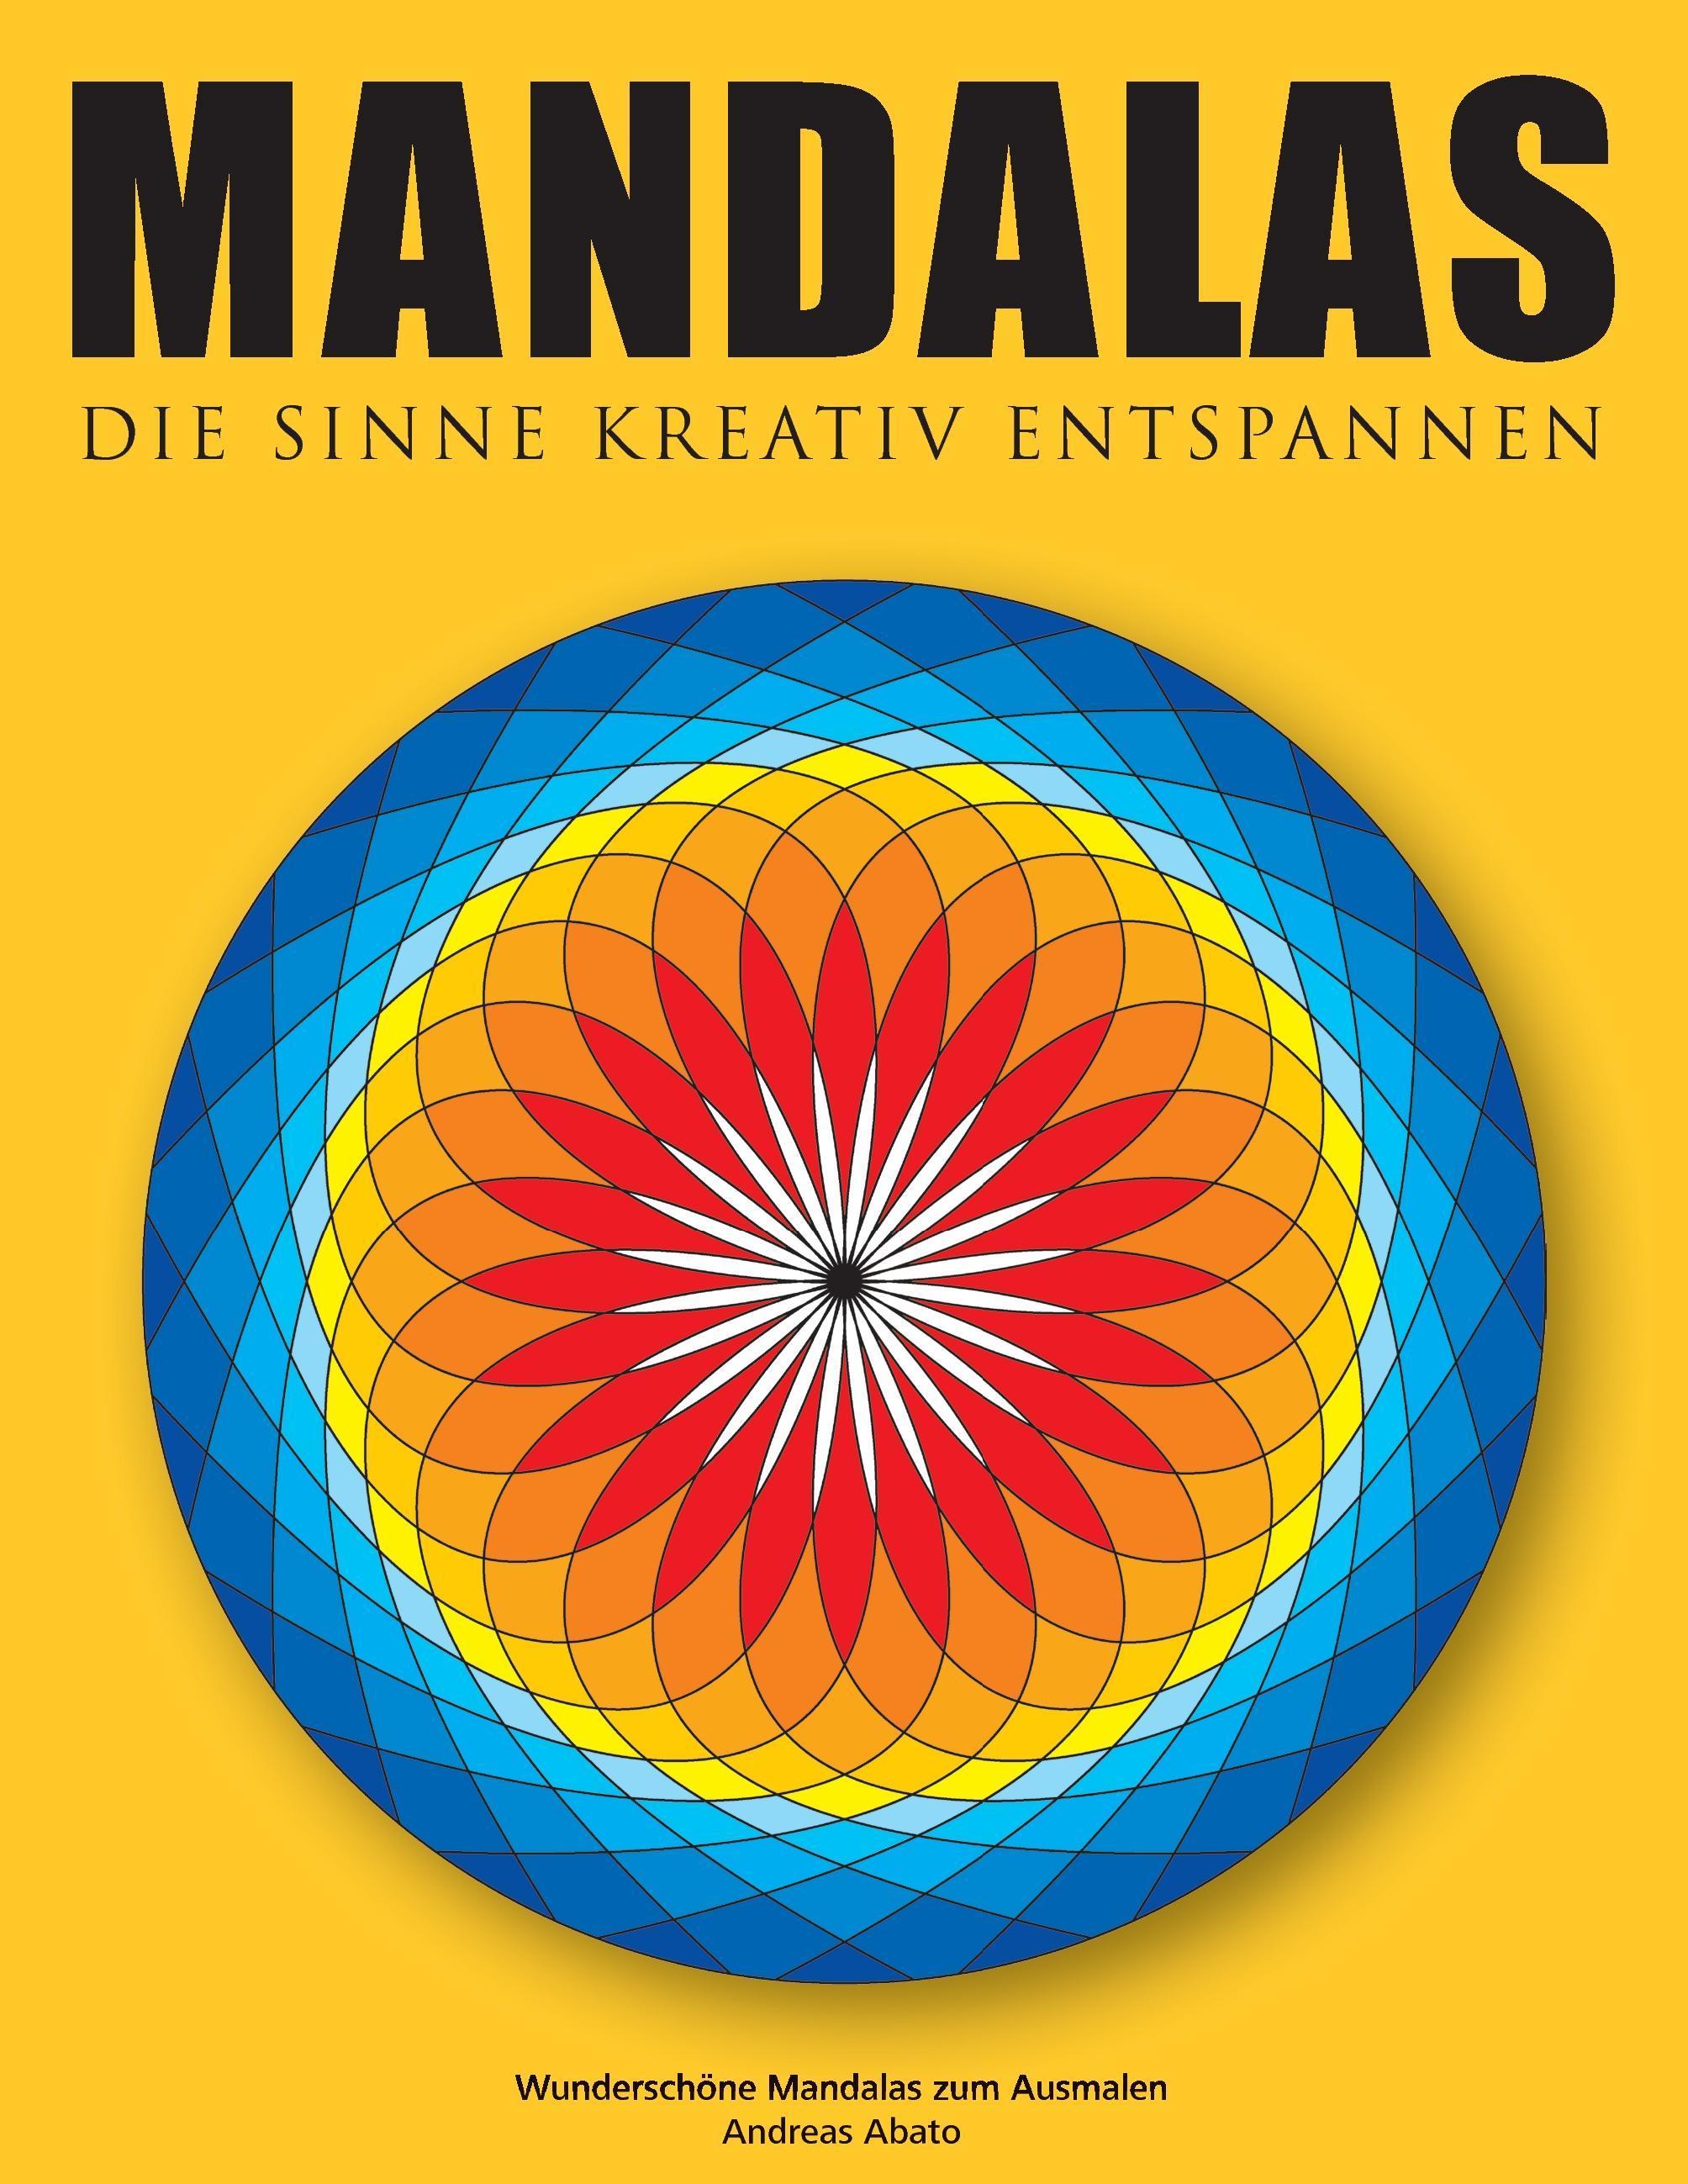 Mandalas - Die Sinne kreativ entspannen